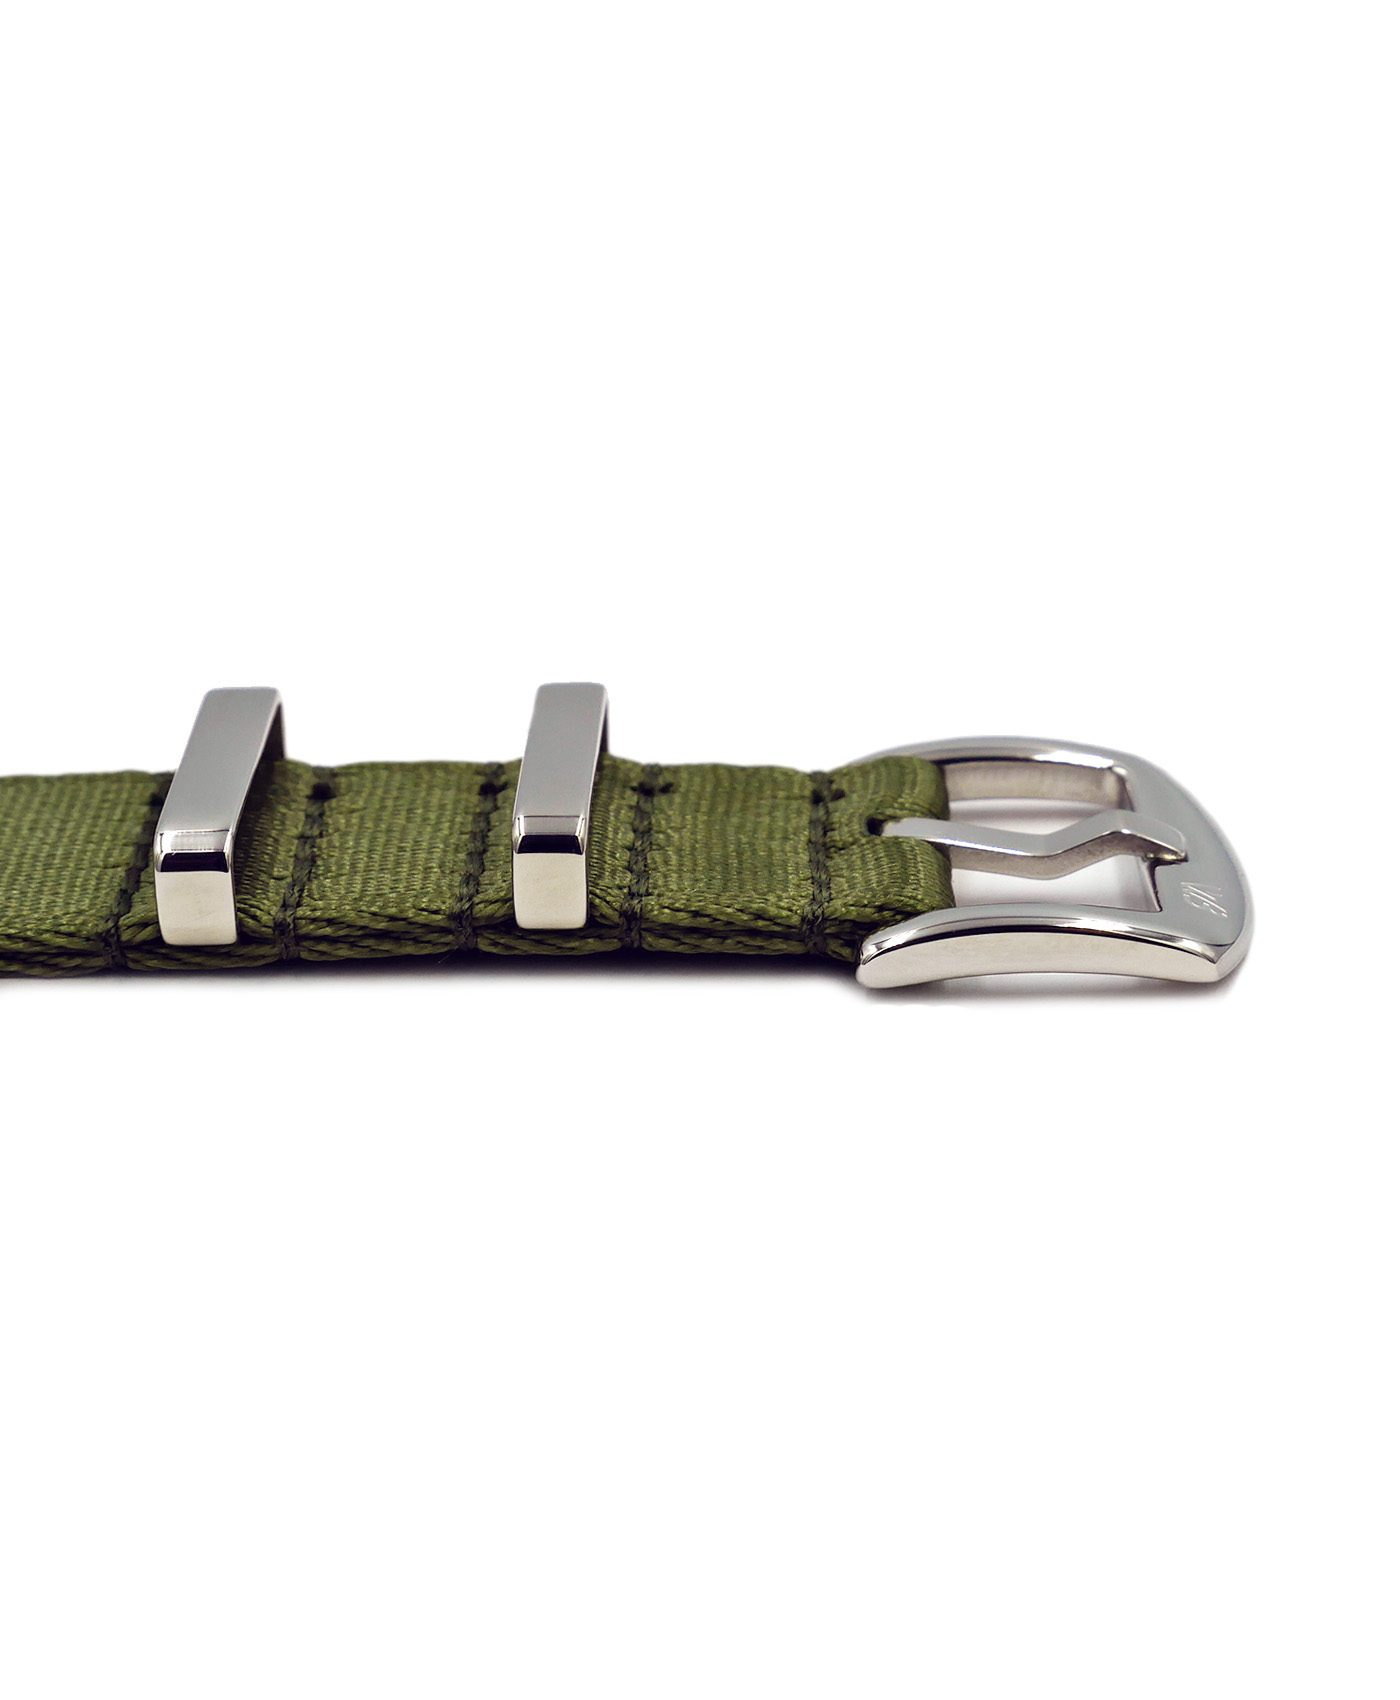 Premium 1.2 mm seat belt polished NATO Strap green buckle by WatchBandit